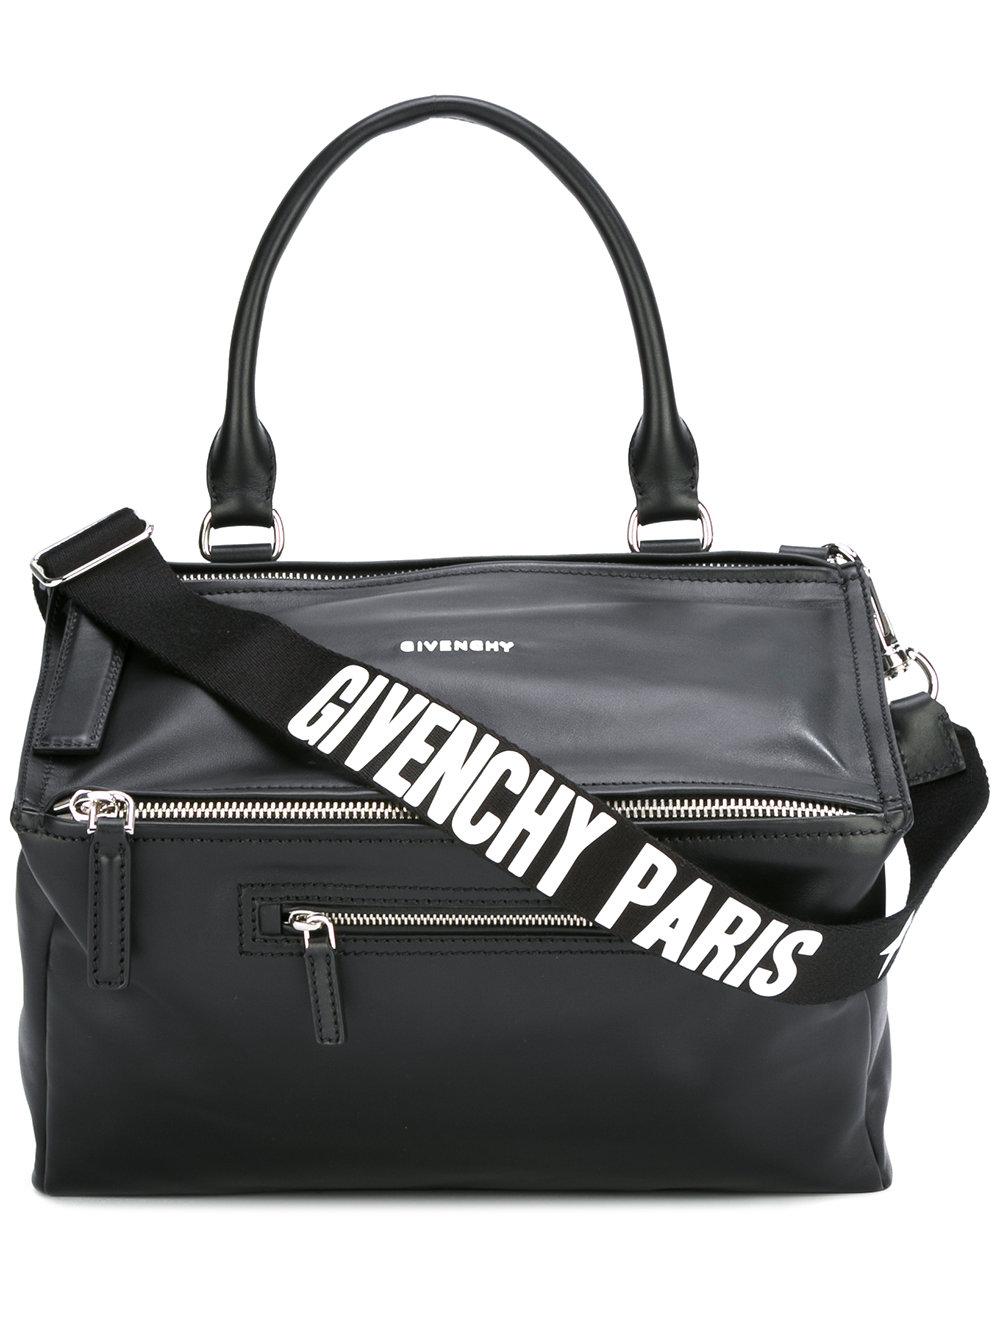 Givenchy PANDORA MEDIUM